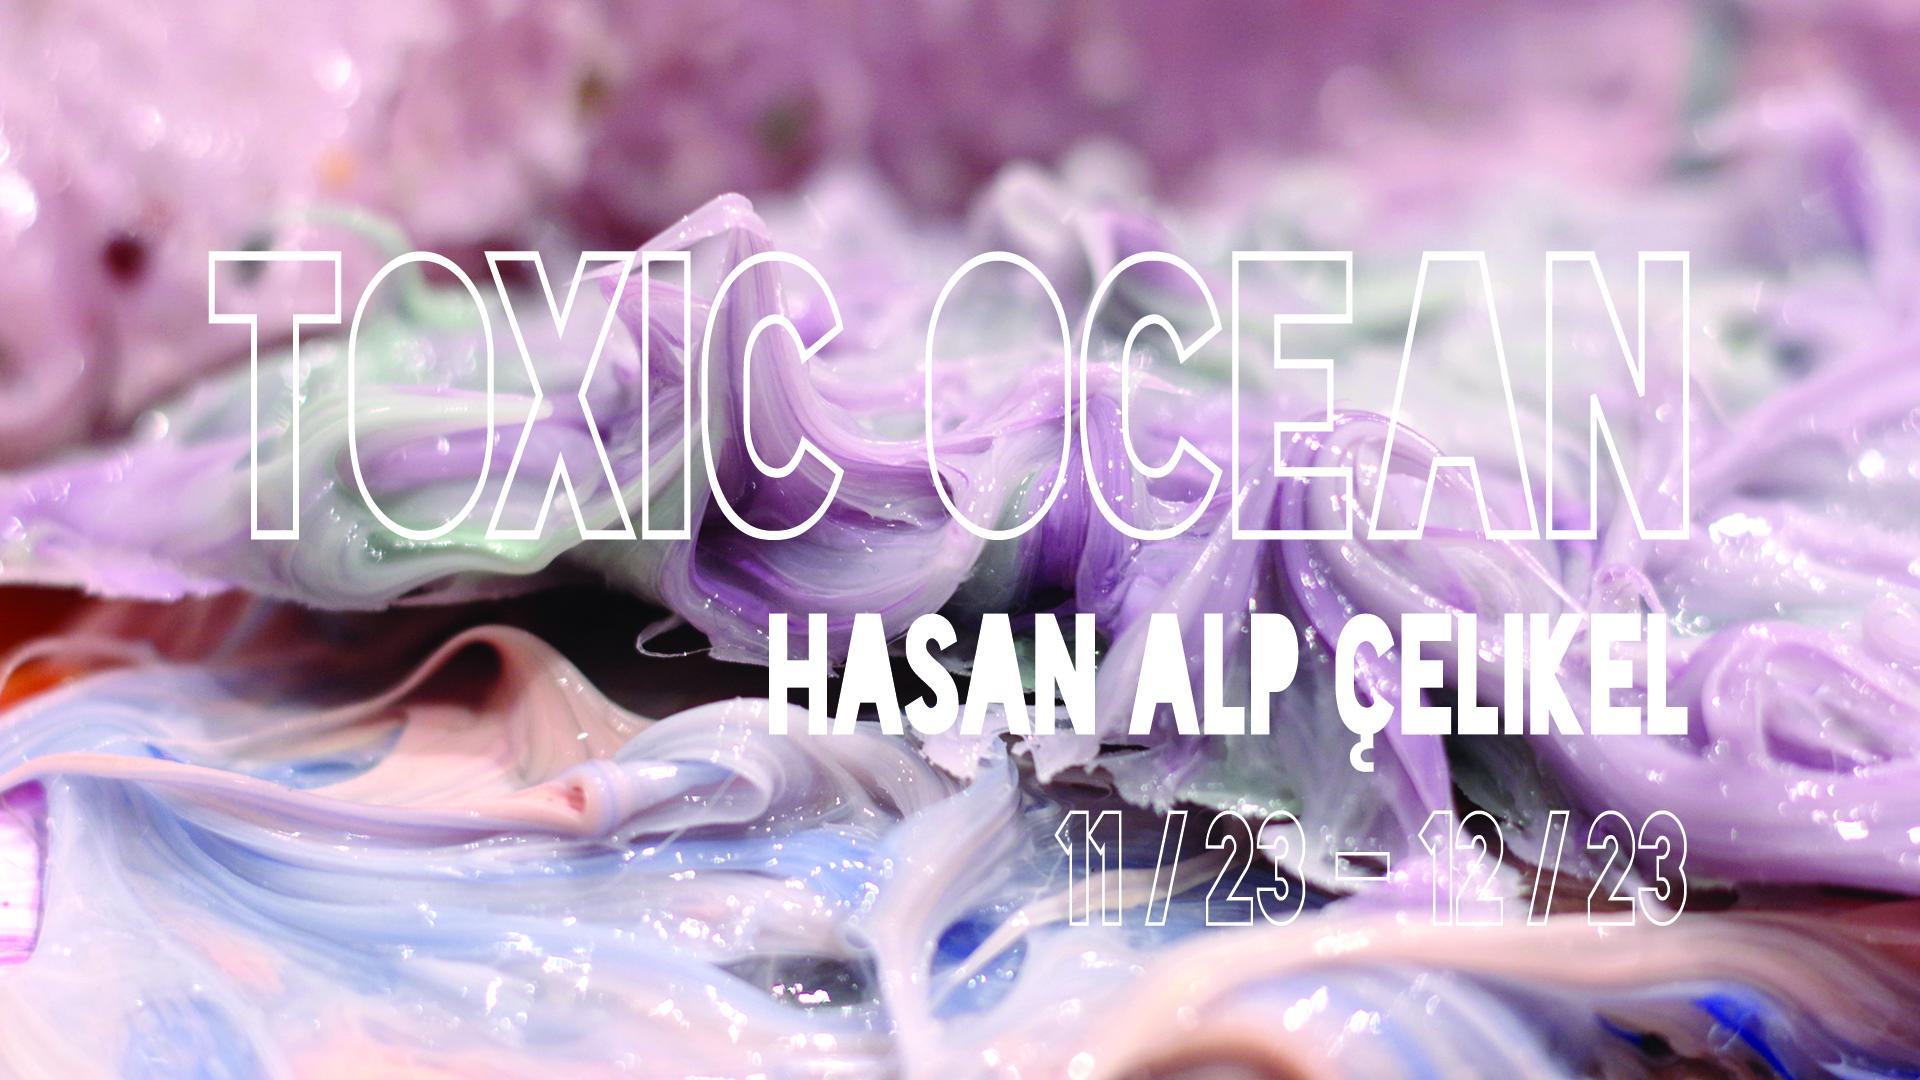 Hasan - Toxic Ocean